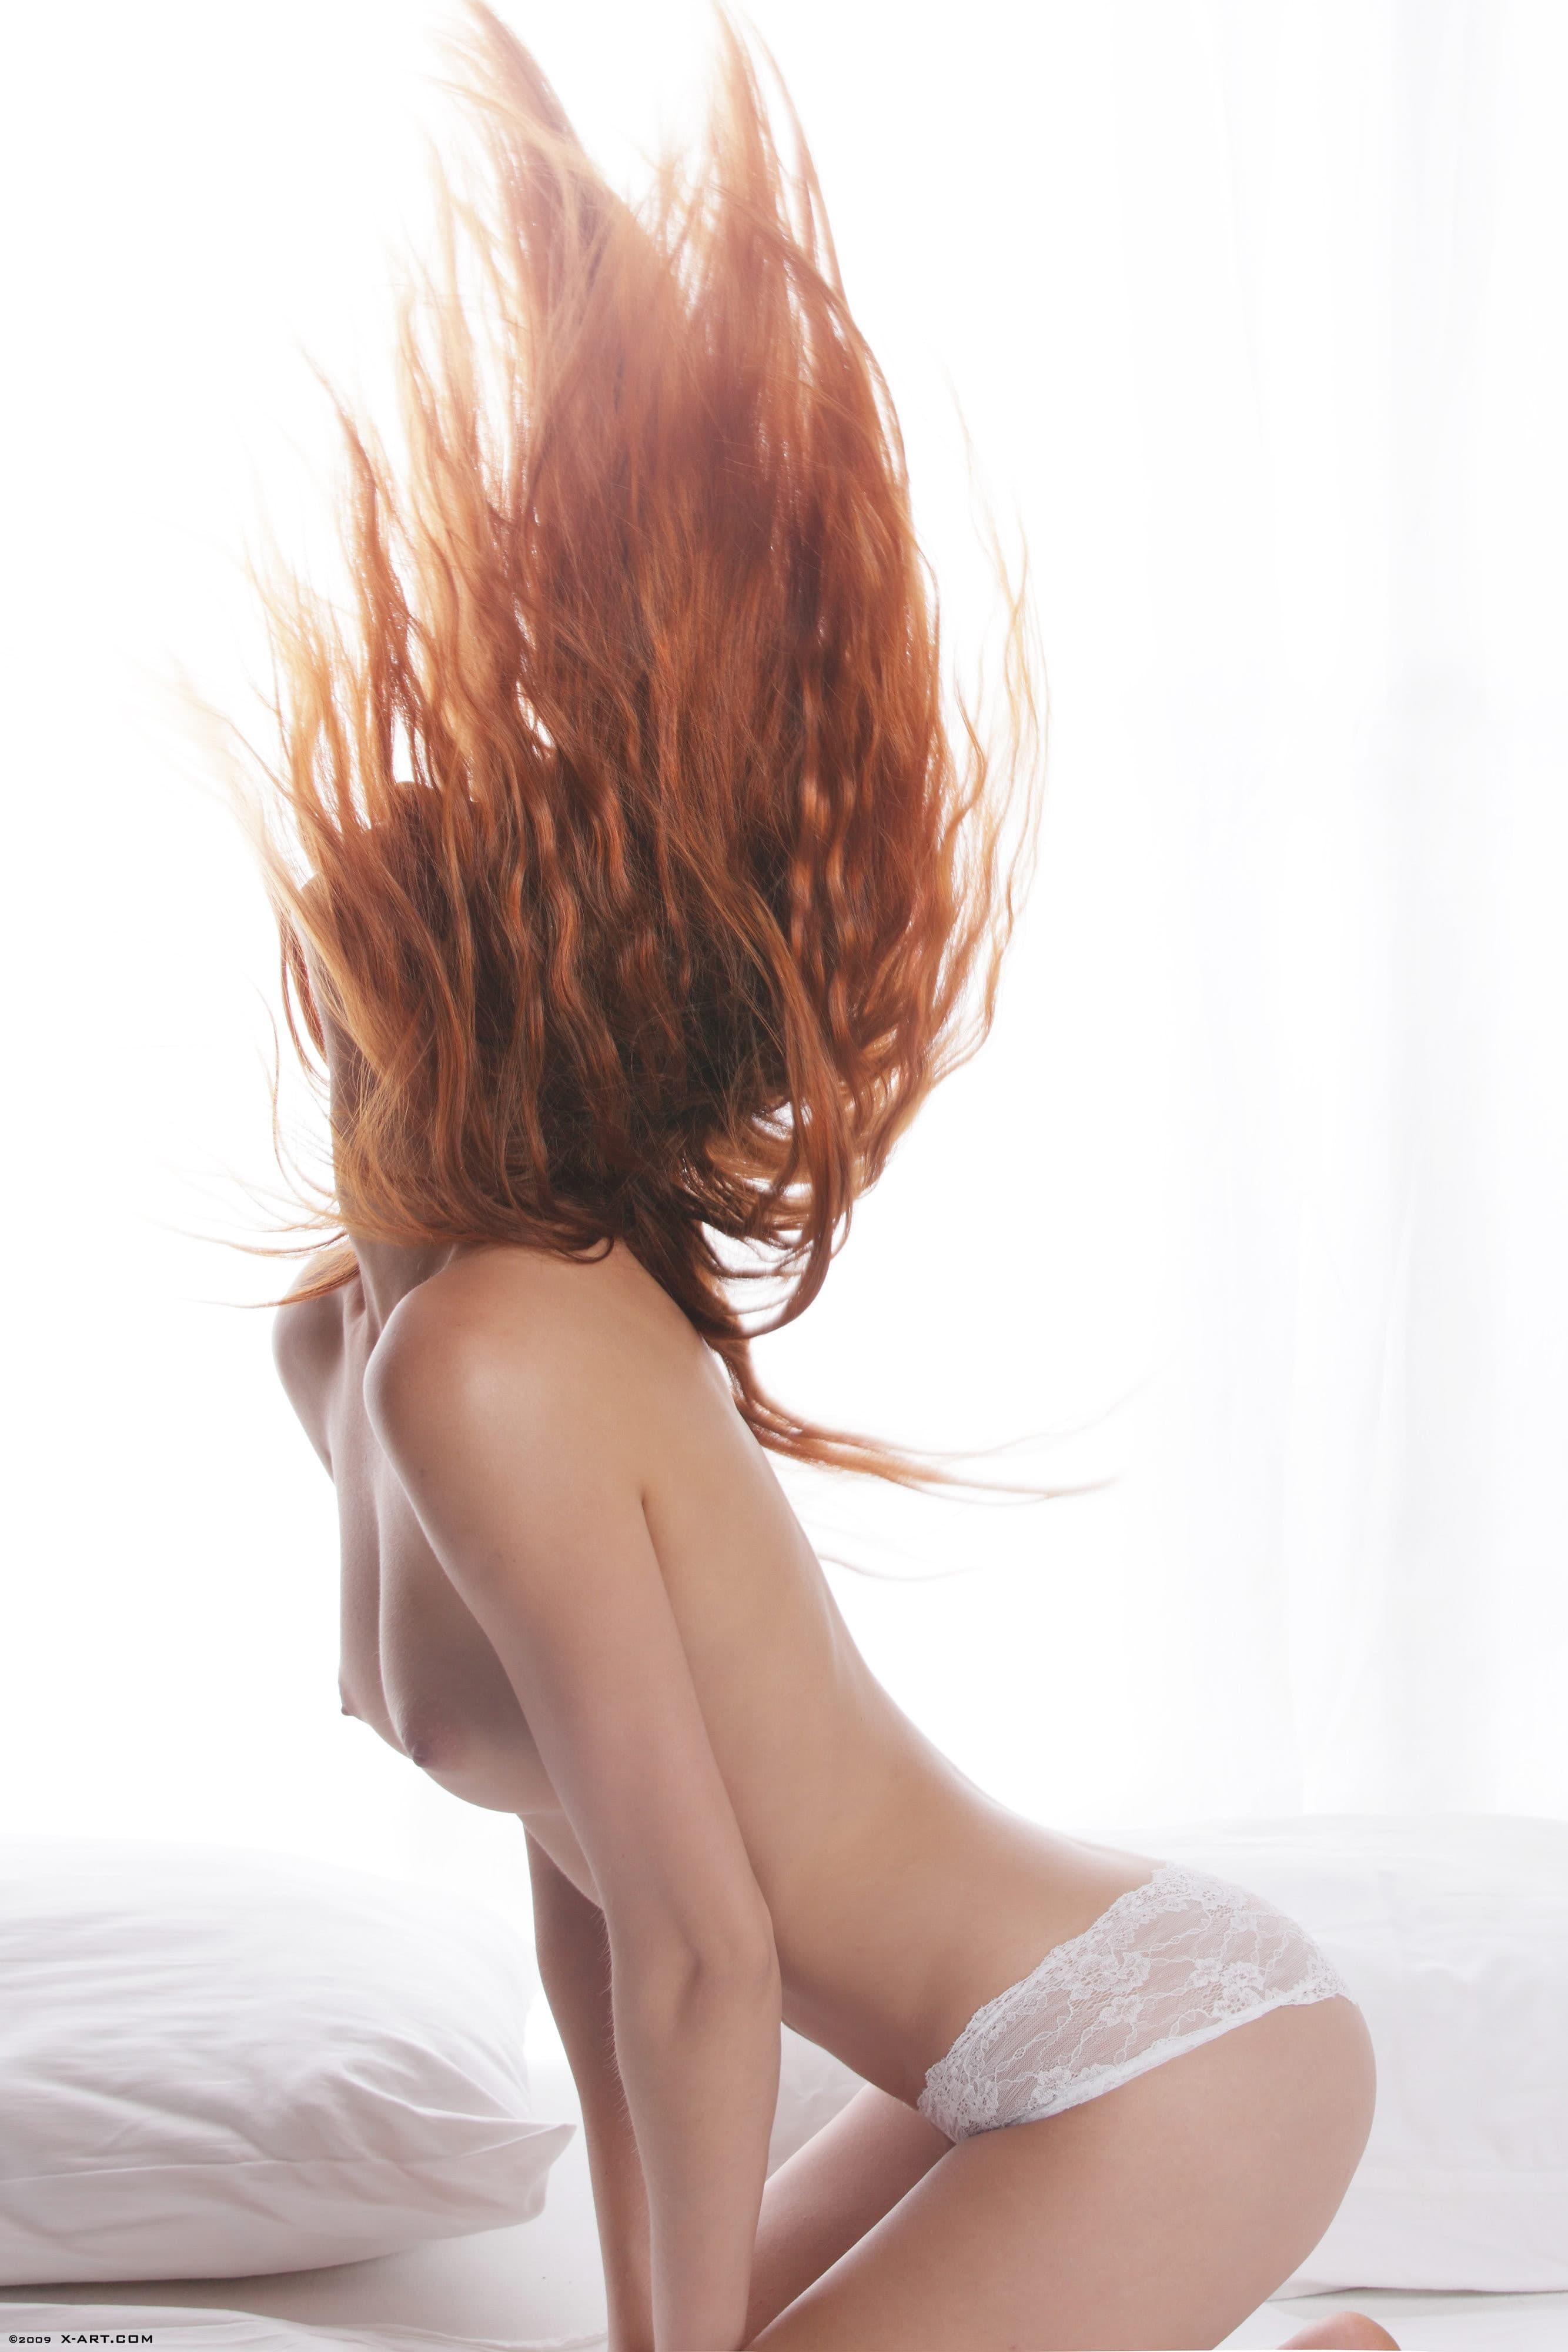 Рыжая красотка сняла трусики на кровати - фото